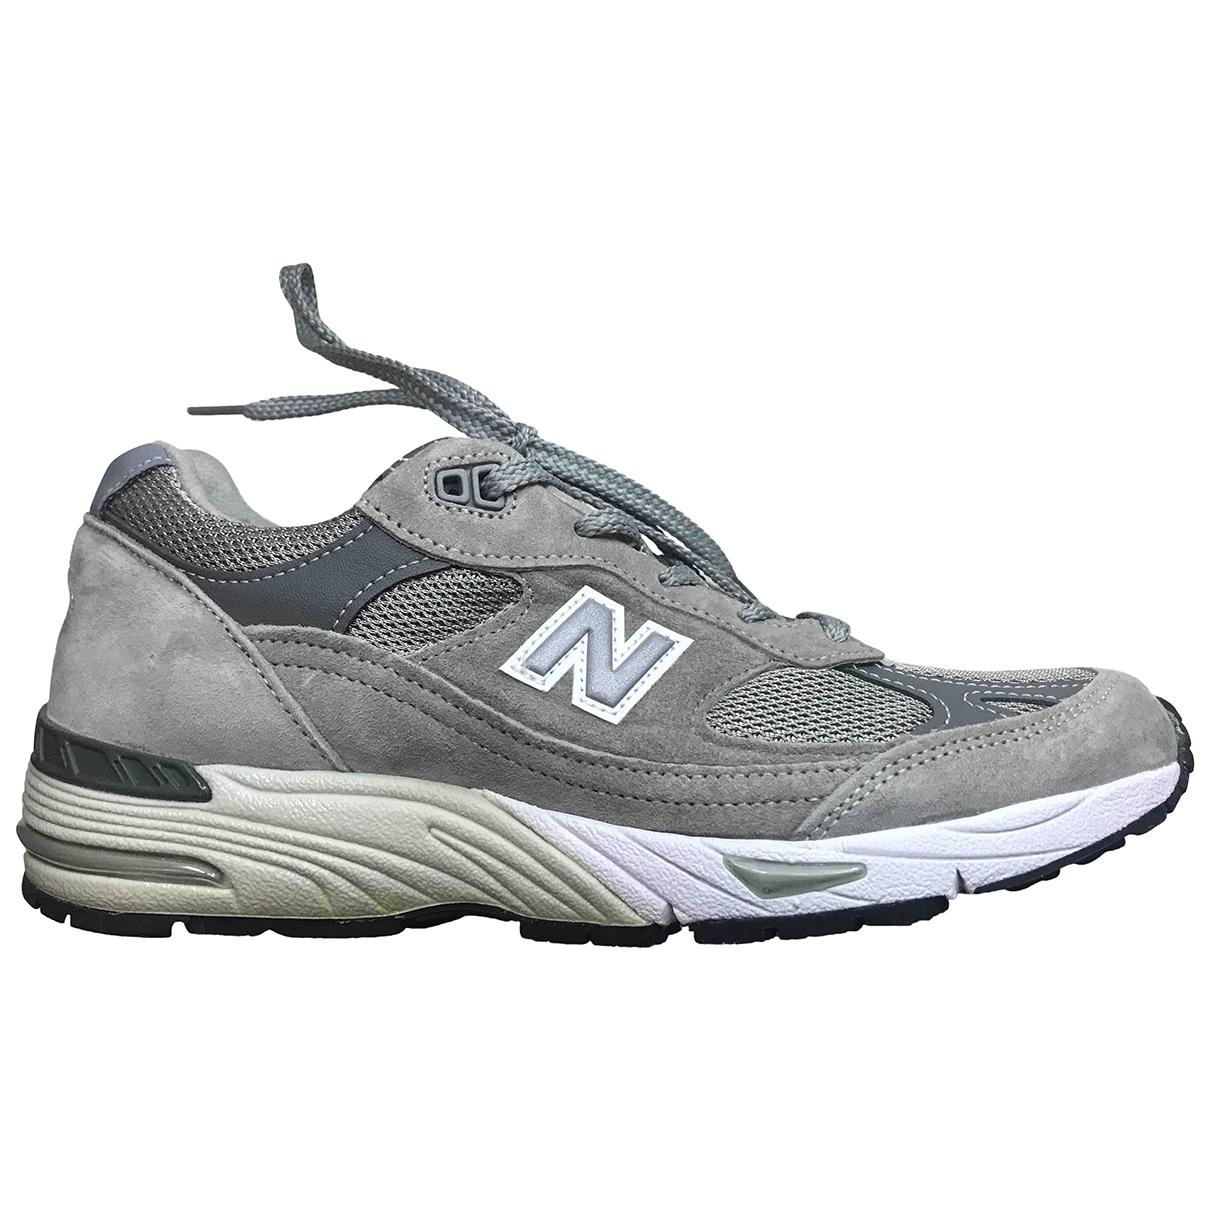 New Balance \N Sneakers in  Grau Leinen